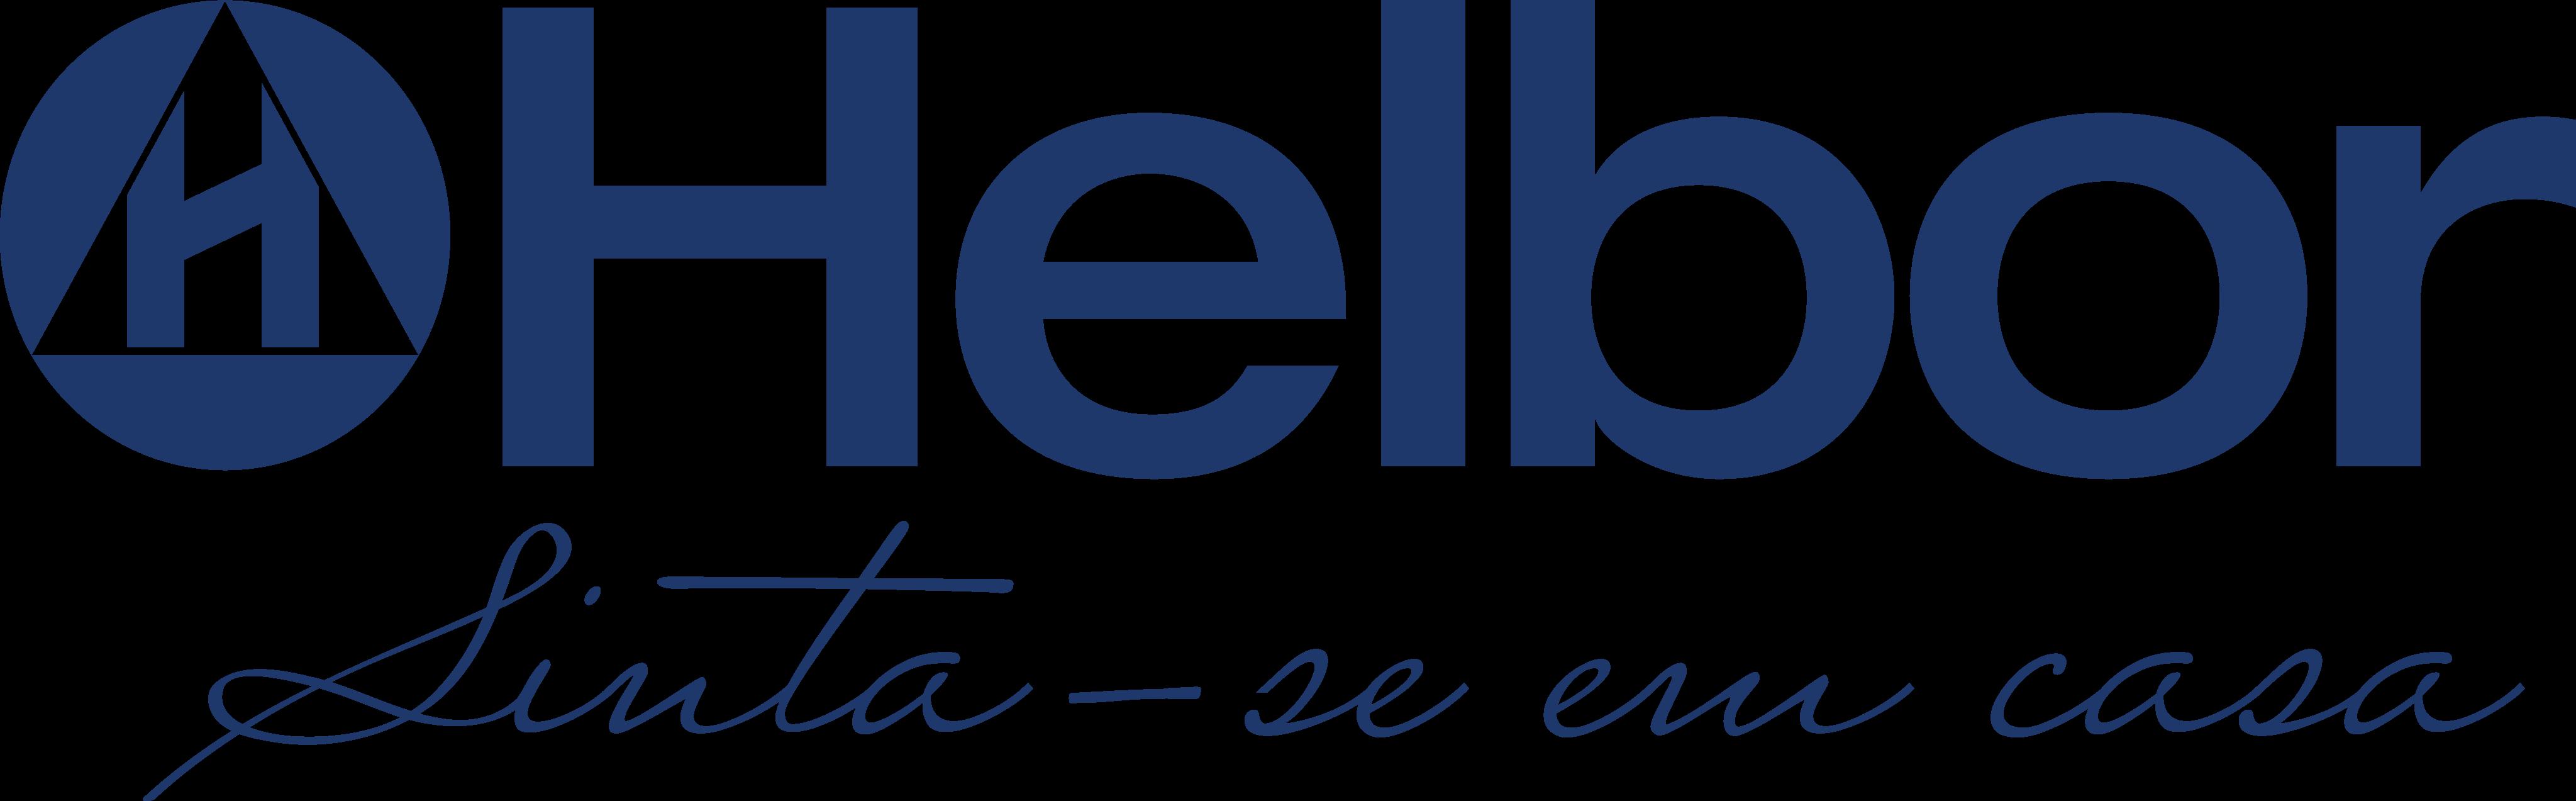 helbor logo 1 - Helbor Logo